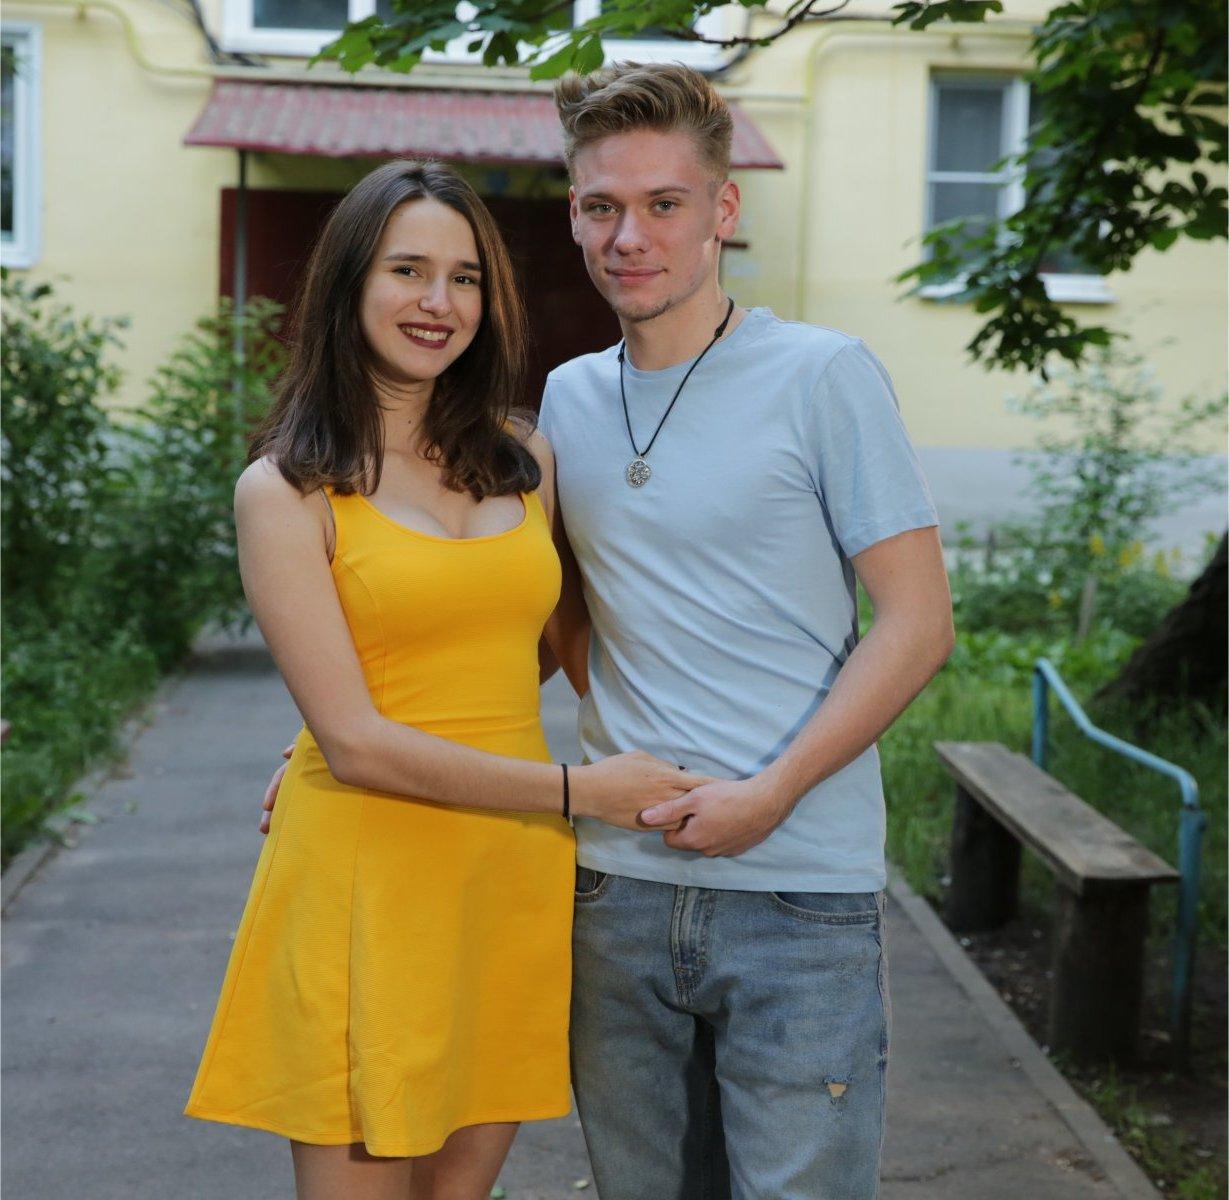 Steven Frend and Olga Koshimbetova